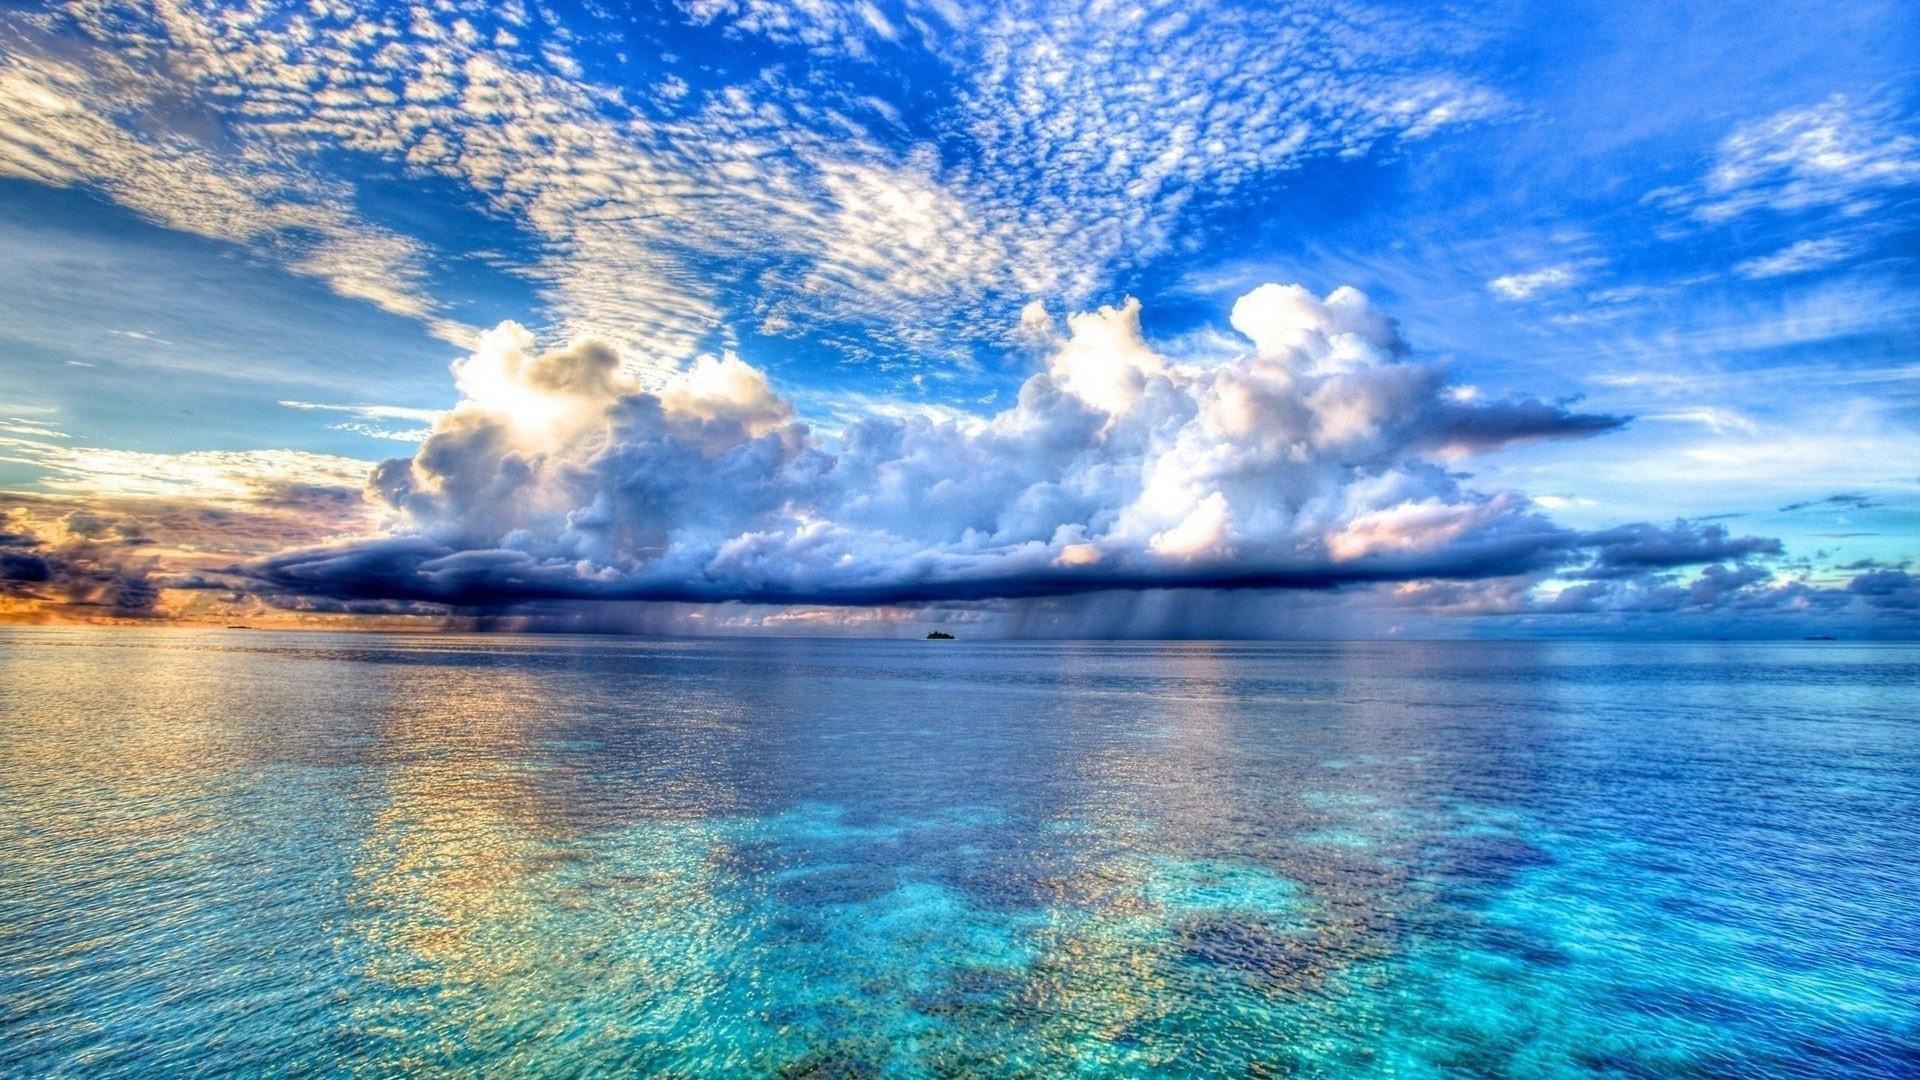 1920x1080 Preview Wallpaper Beach Tropics Sea Sand Palm Trees Clouds